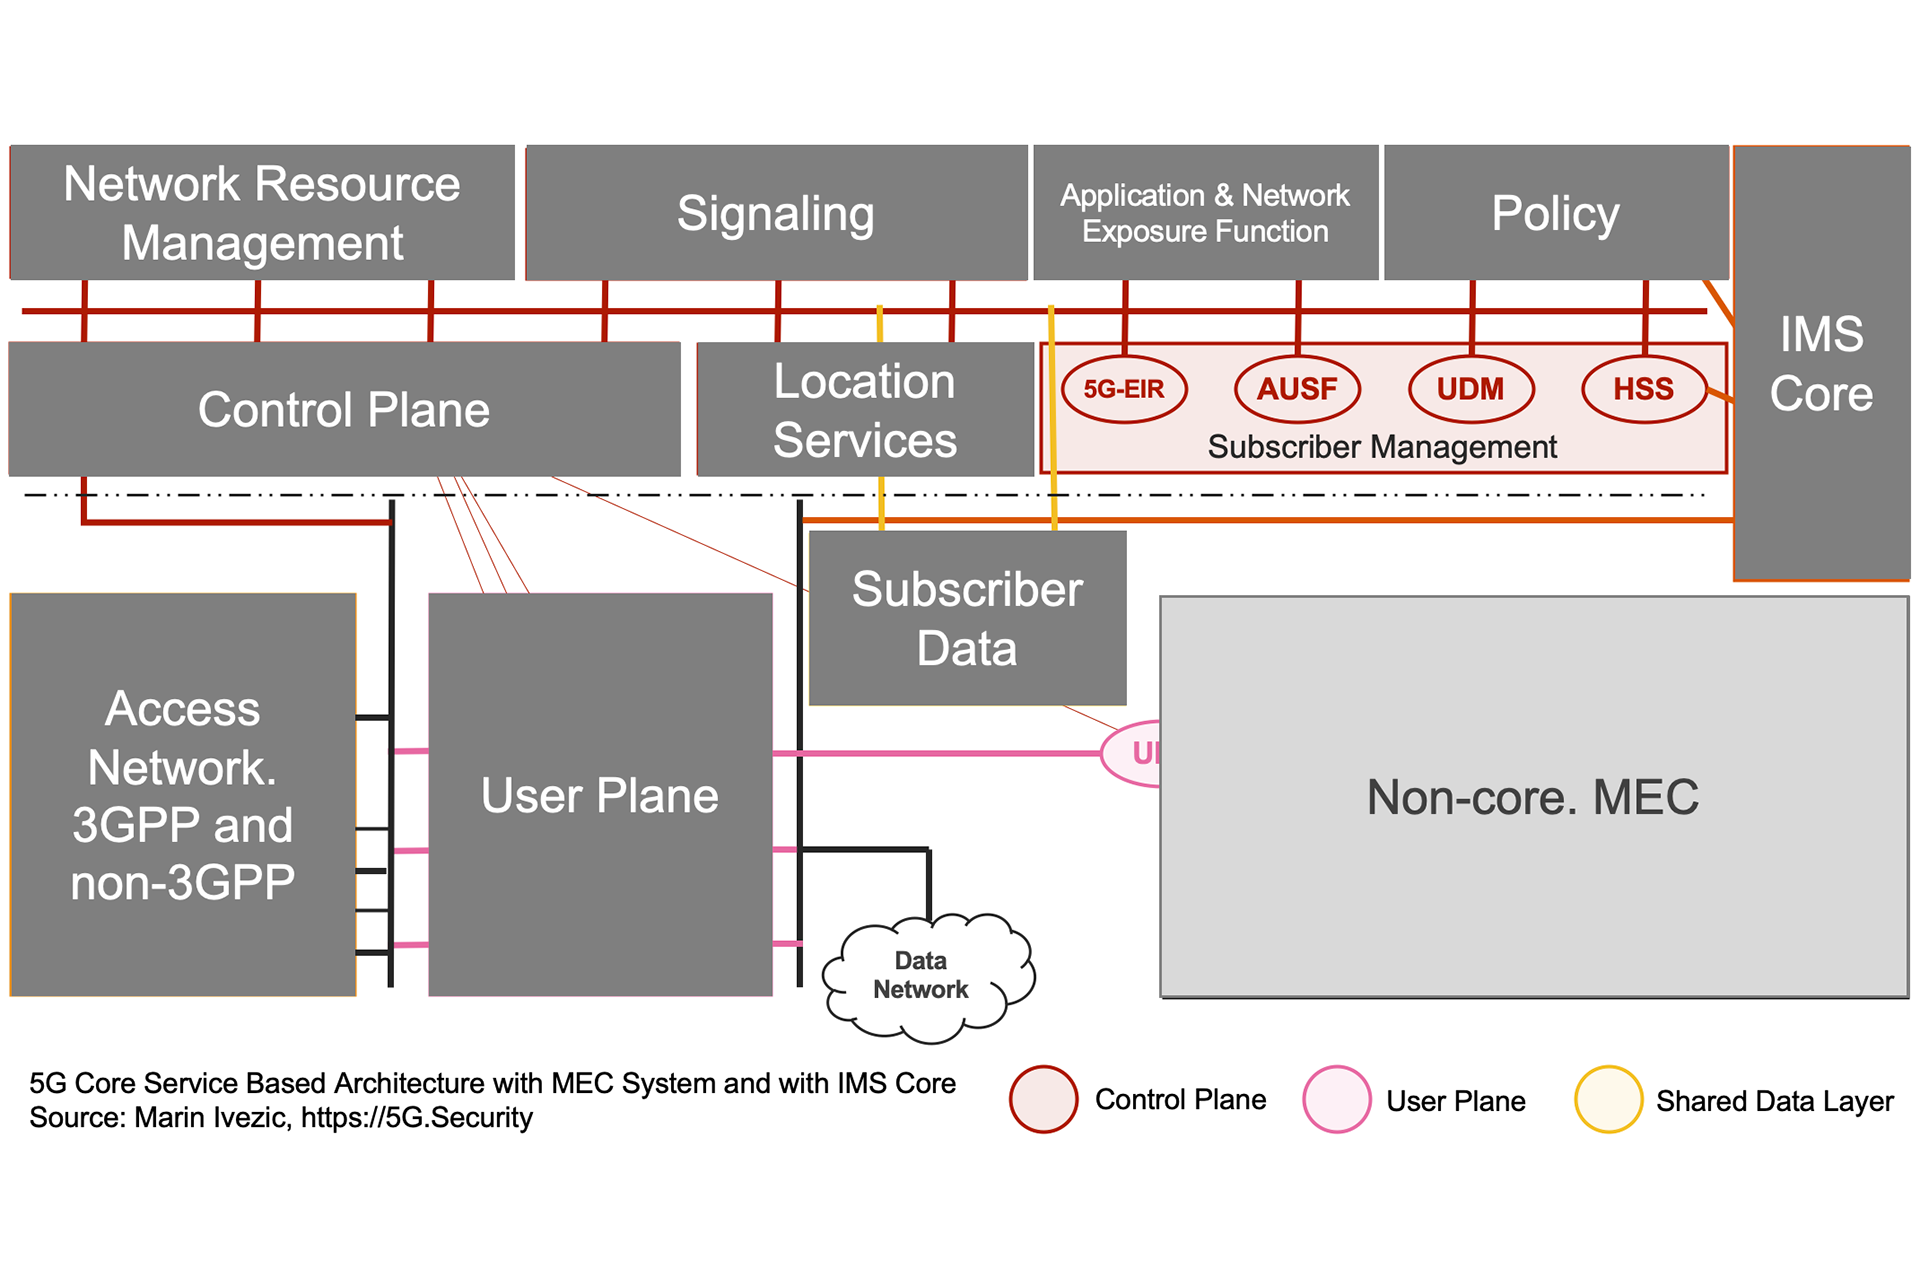 5G SBA IMS MEC Architecture - Subscriber Management